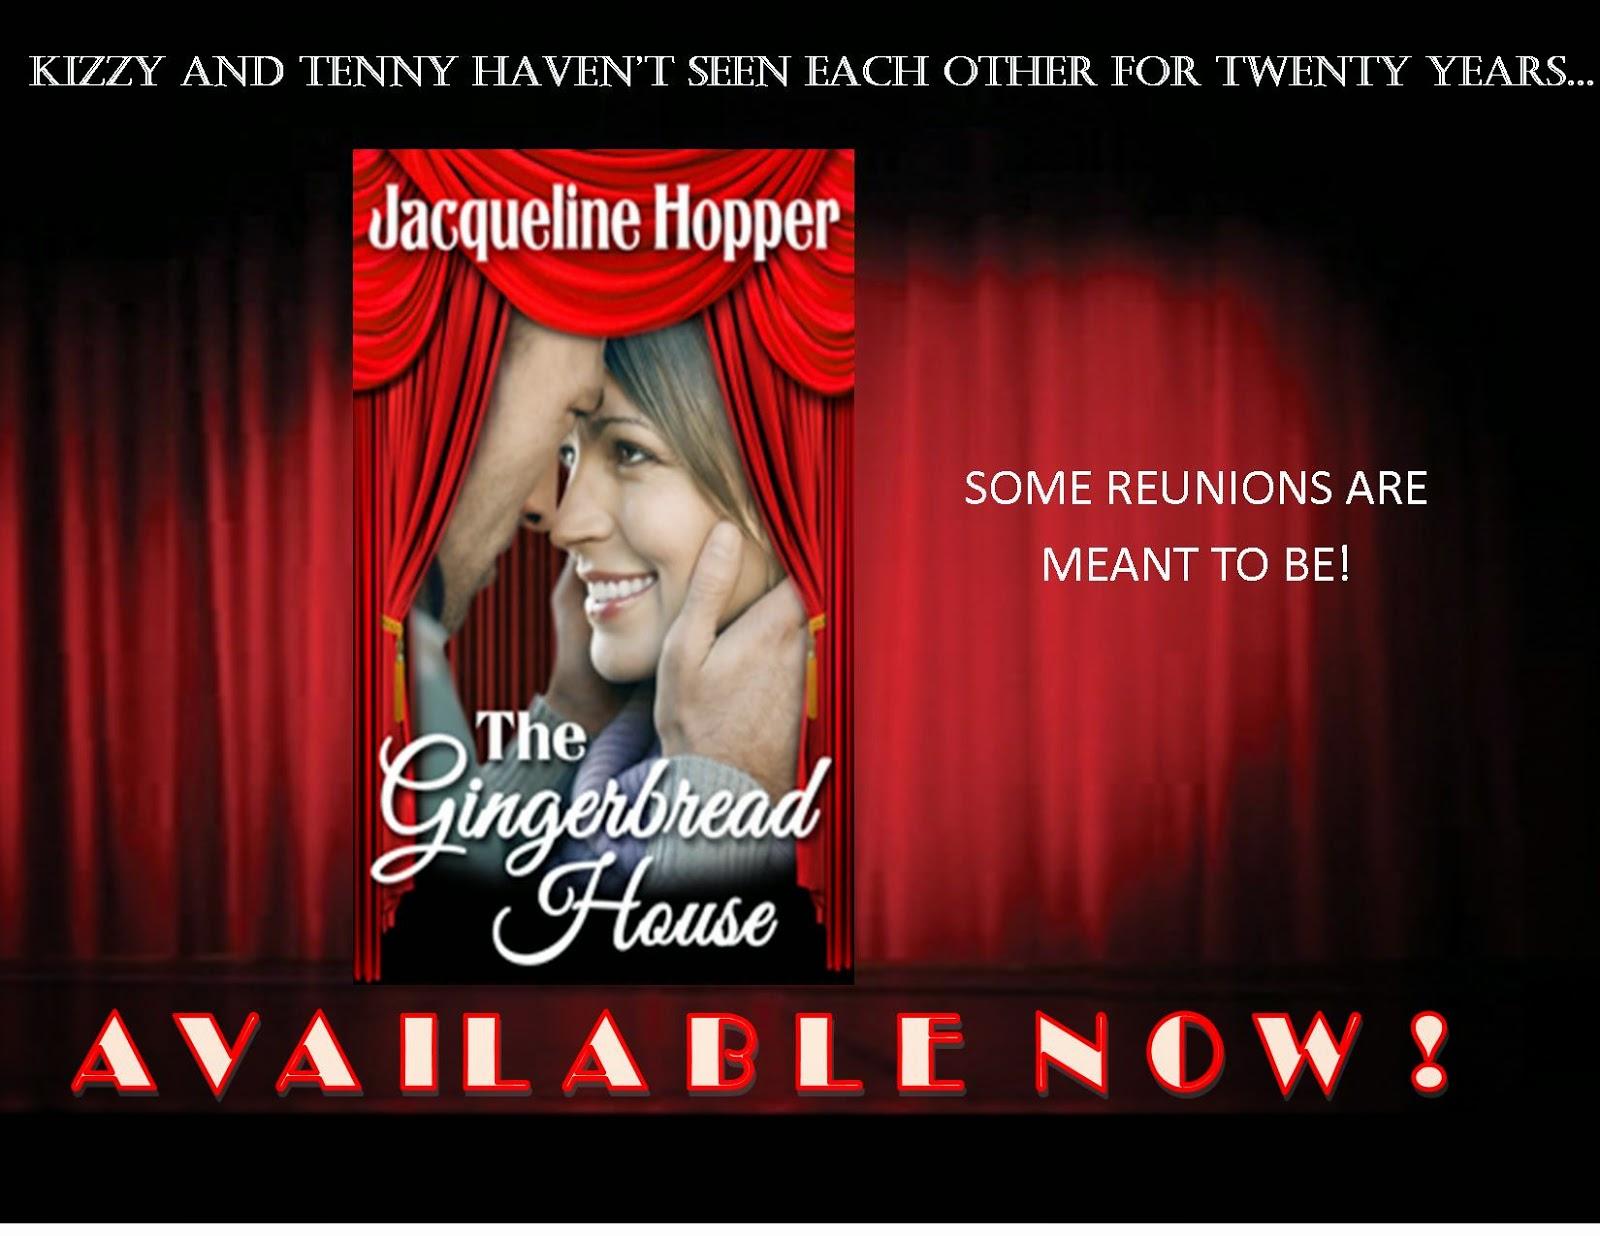 http://www.amazon.com/Gingerbread-House-Jacqueline-Hopper-ebook/dp/B00GBE1U3K/ref=sr_1_1?ie=UTF8&qid=1424657392&sr=8-1&keywords=jacqueline+hopper